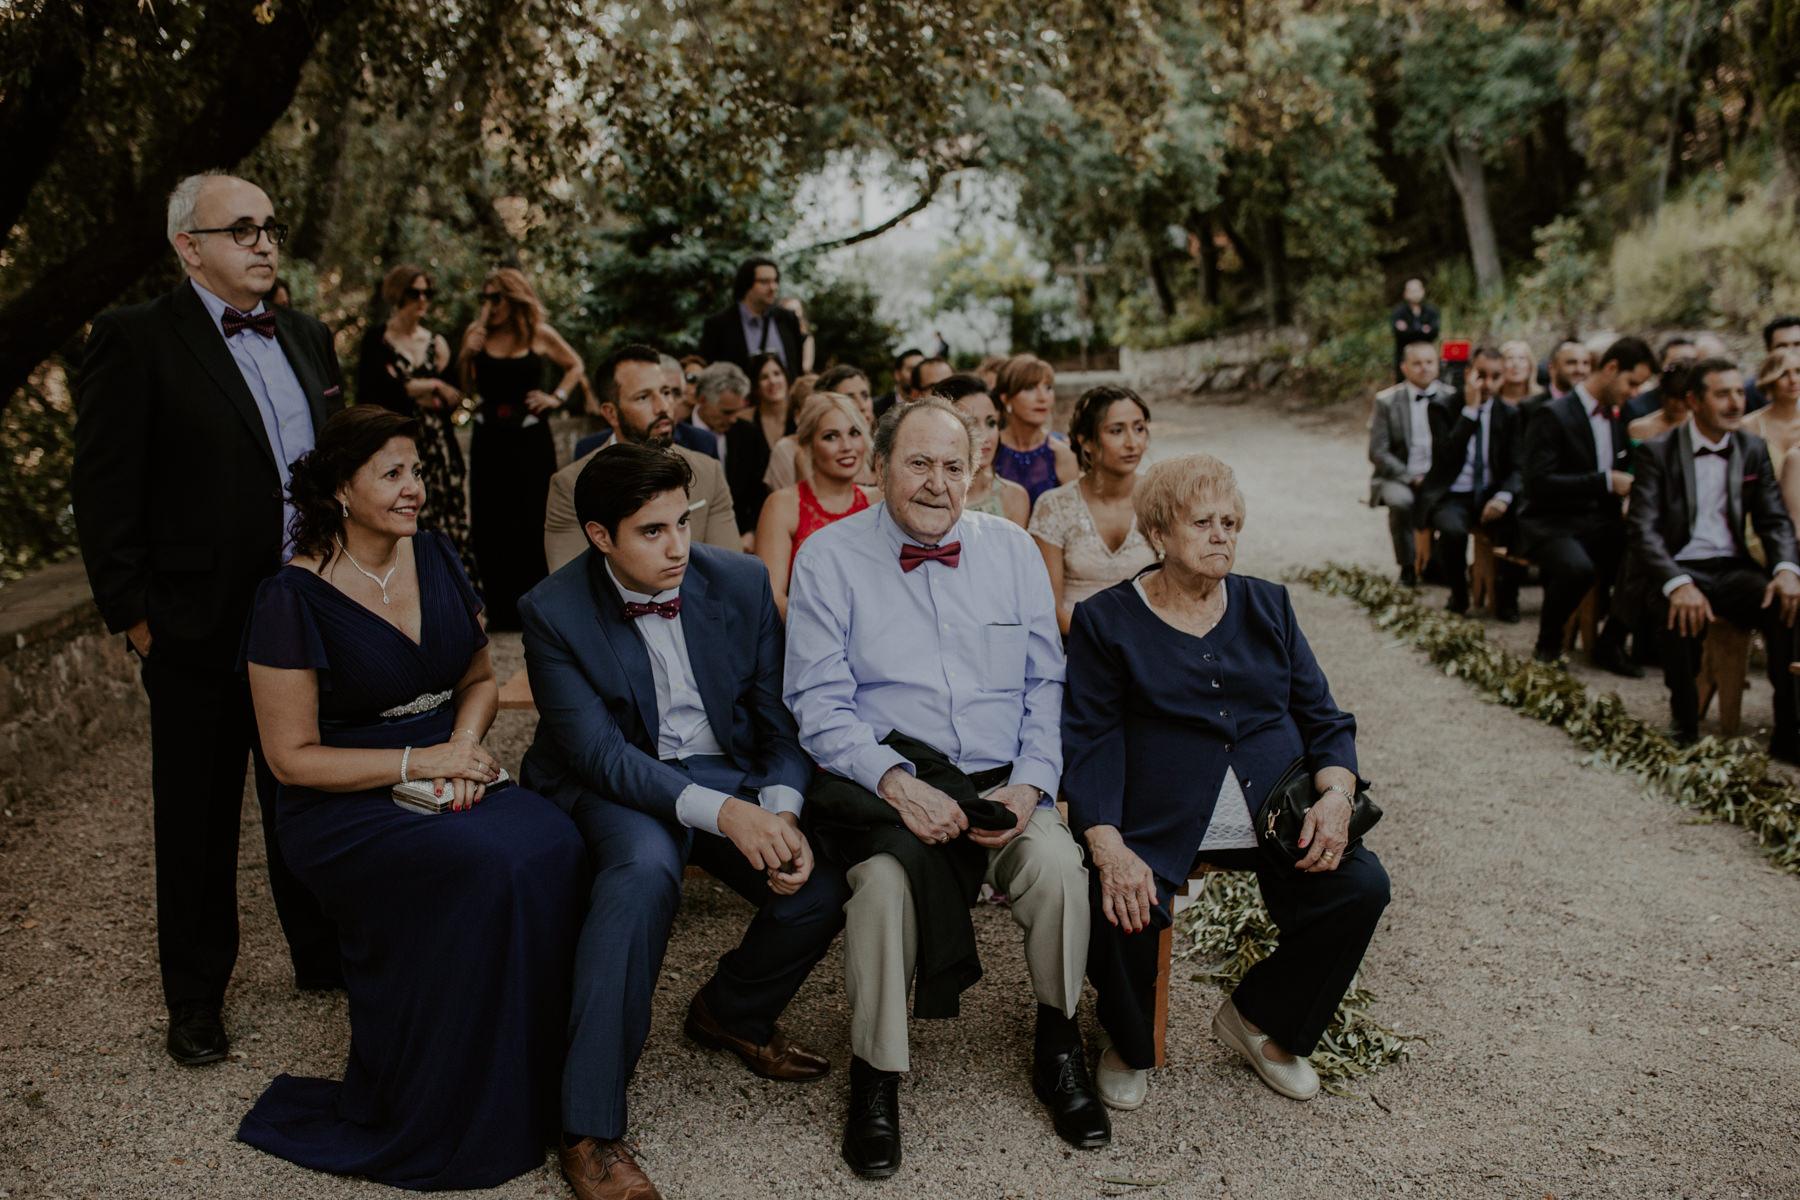 alt_thenortherngirlphotography_couples_weddingphotographer_photographer_wedding_boda_fotografodebodas_fotografobodasbarcelona_bodaindie_bodasconestilo_bodaensantperedeclara_jennifermiguel-388.jpg